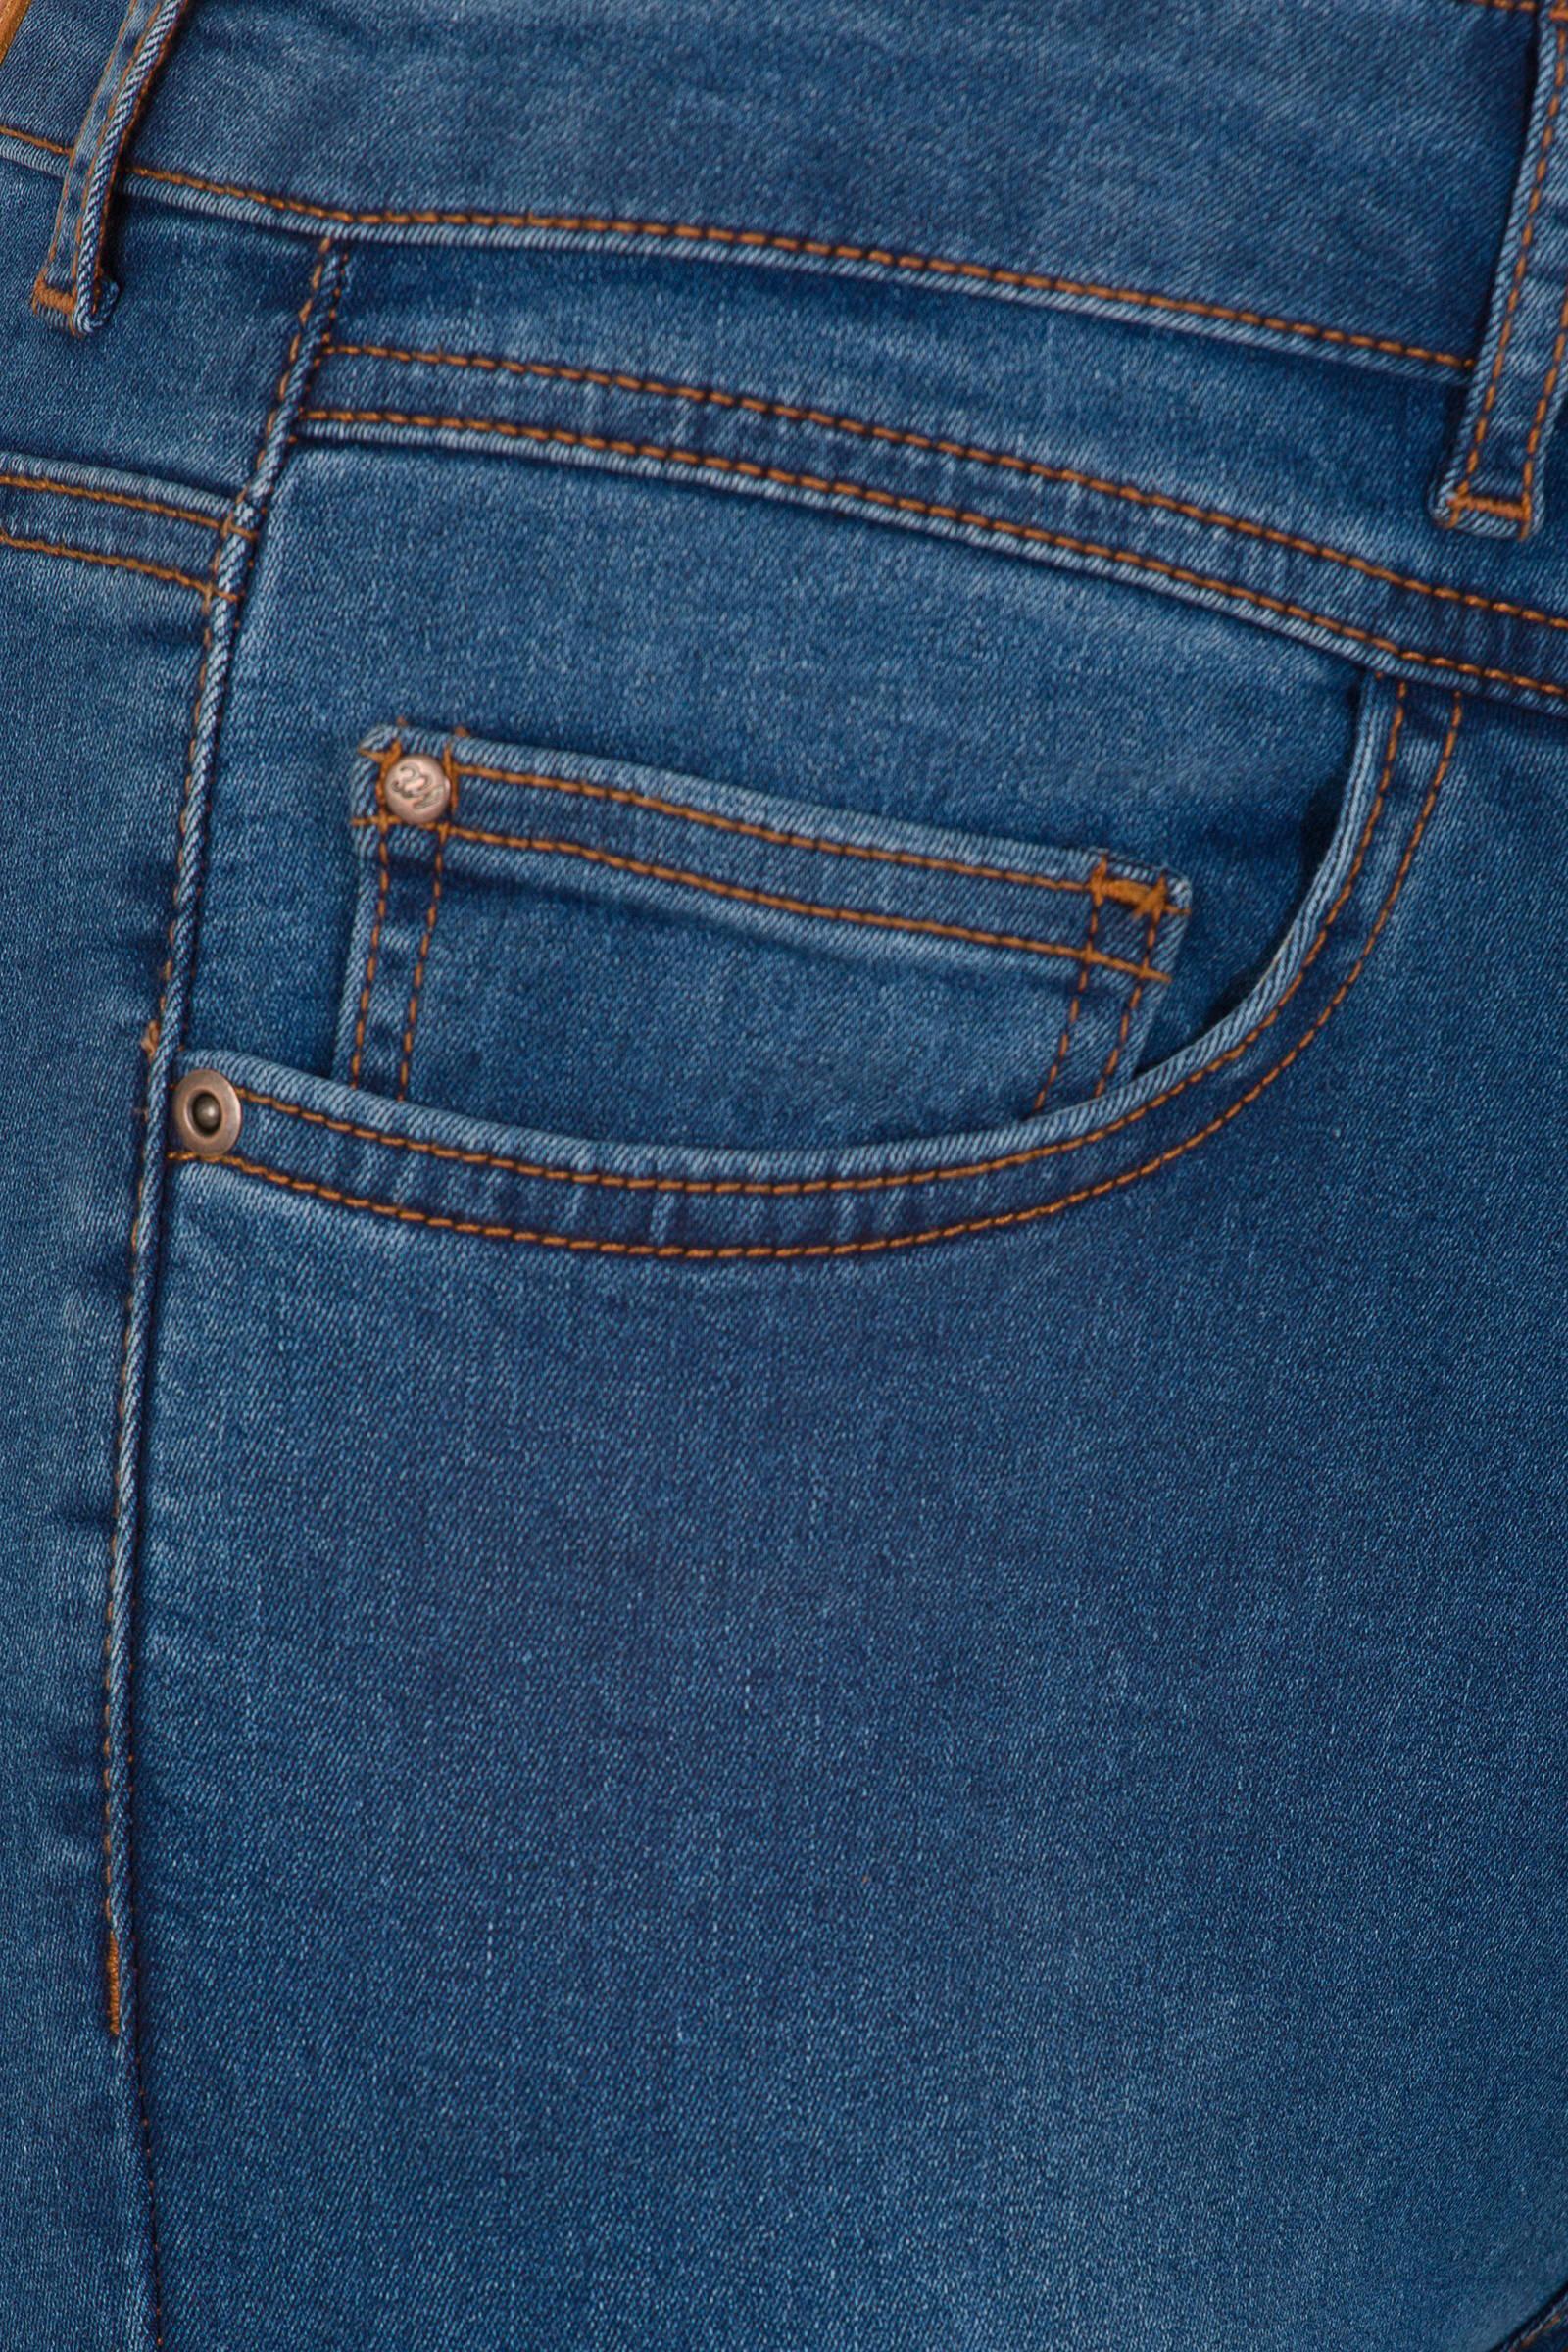 Miss Etam Regulier high waist skinny jeans Julie Go Green 32 inch blauw